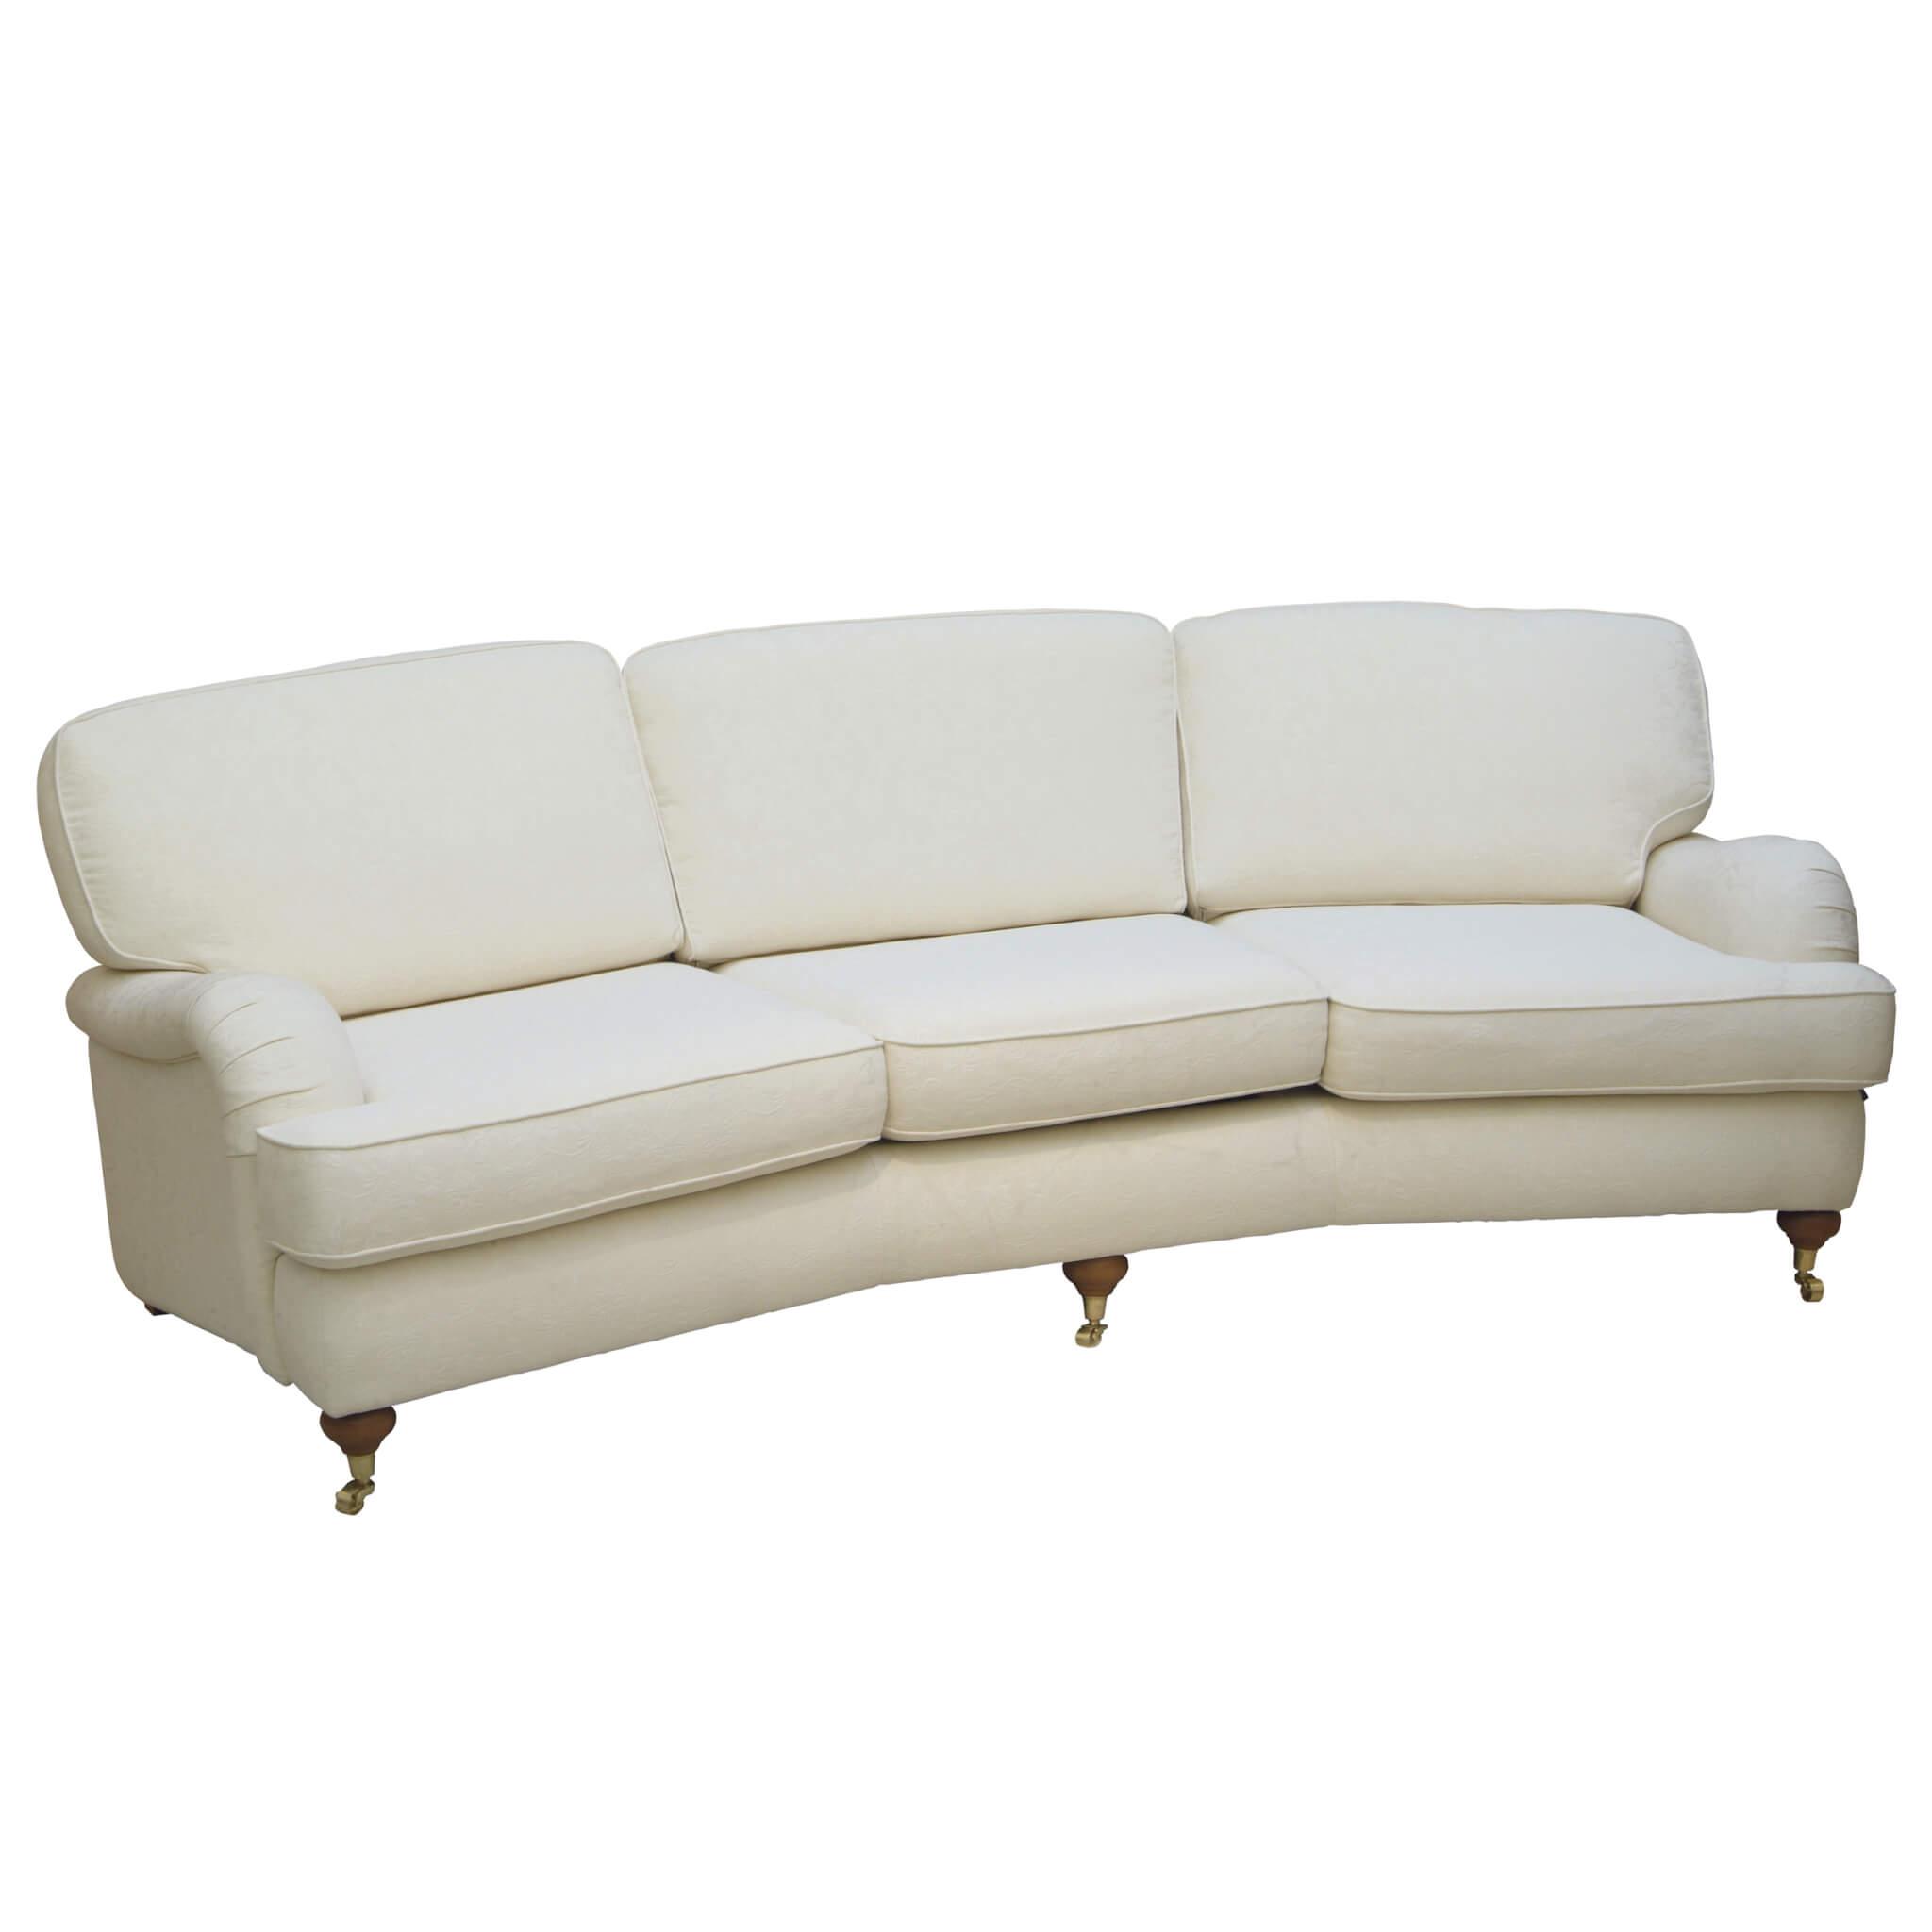 sofas birmingham italian leather sofa houston tx 3 sitzer geschwungen mit festbezug phönix